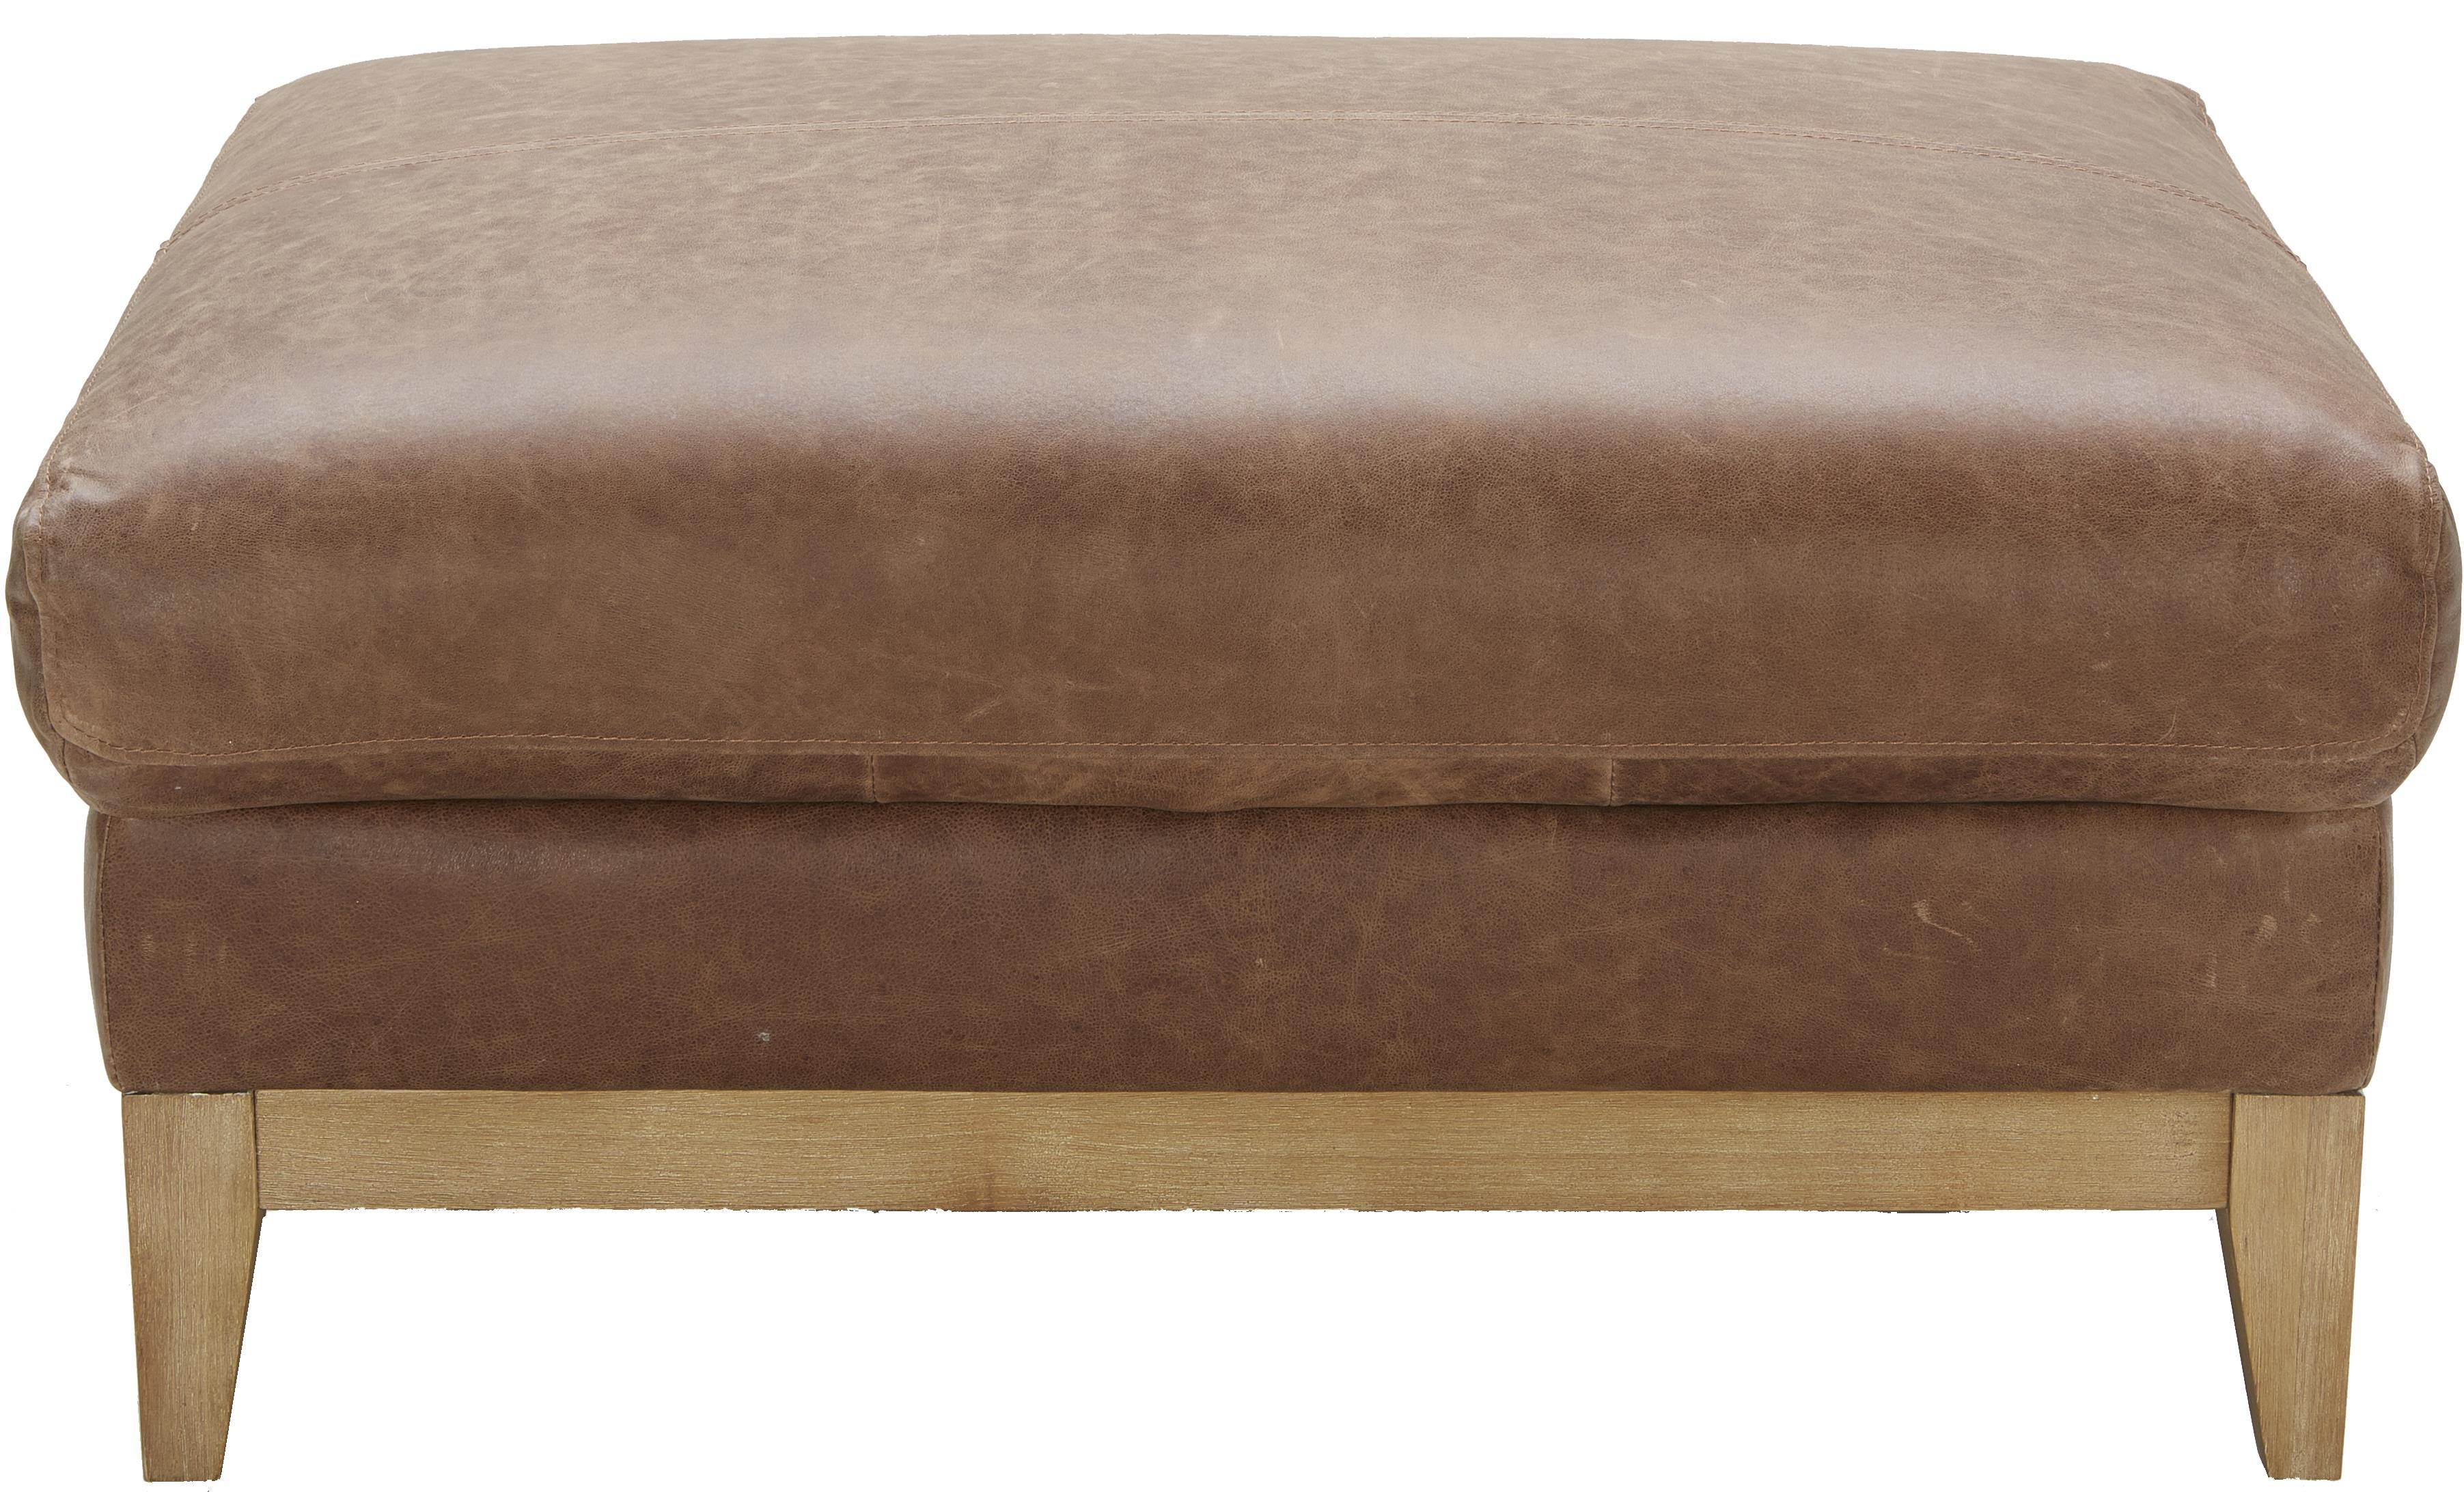 Urban Evolution Baker Modern Leather Ottoman - Item Number: 5179O-NL9303-G021